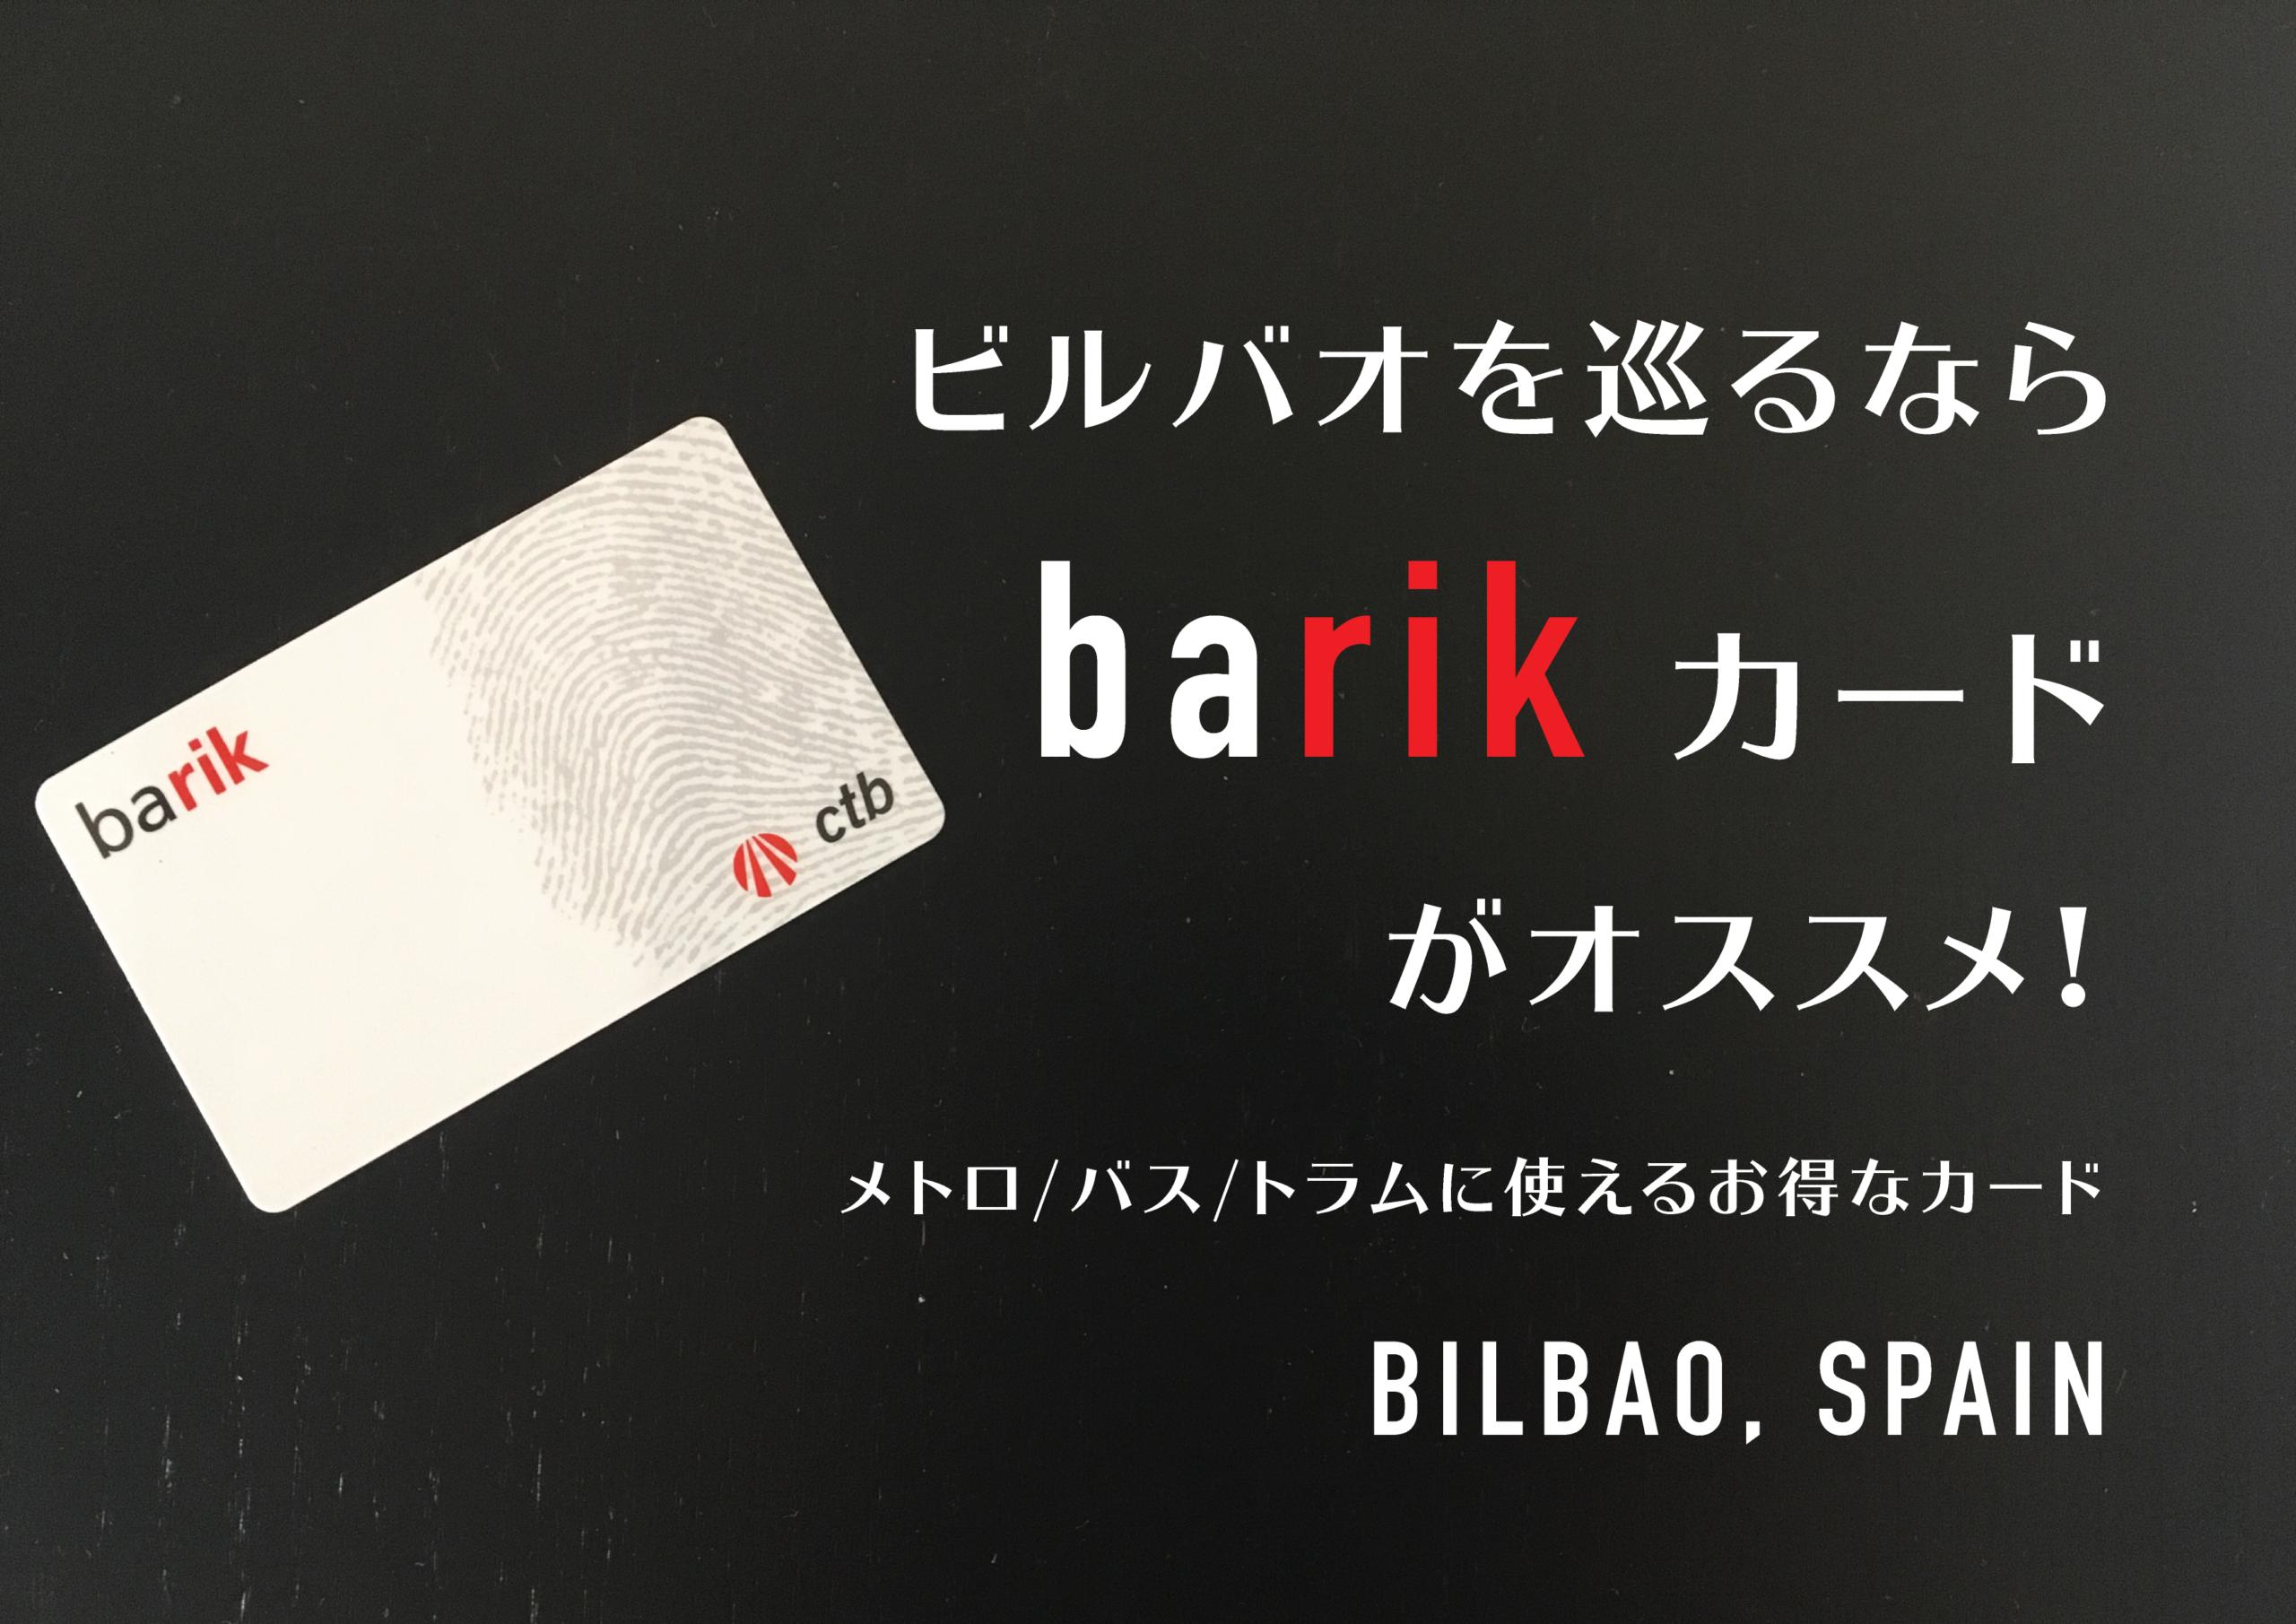 BarikCard 01 1 scaled